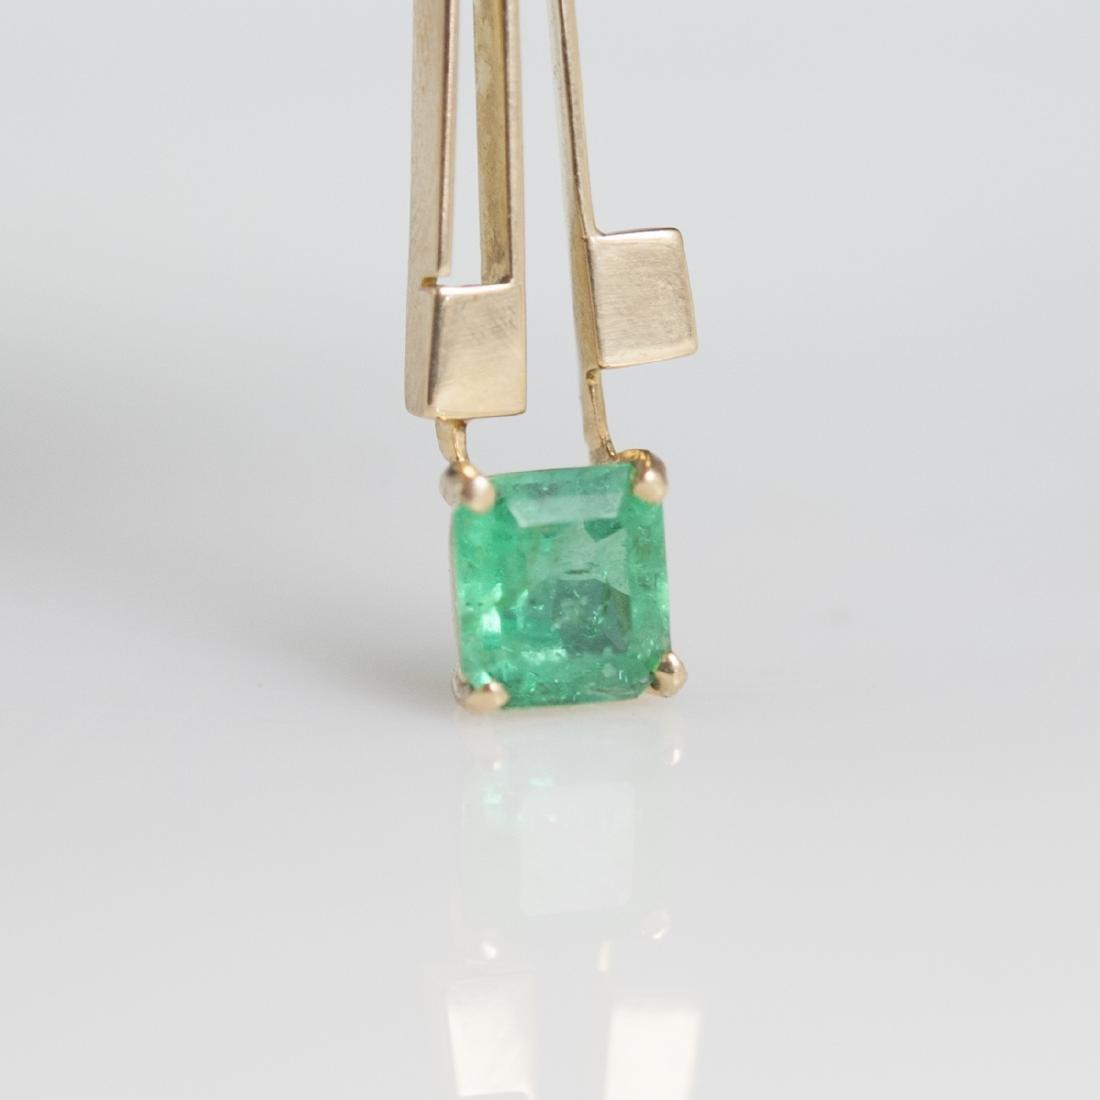 18kt Gold & Emerald Pendant - 5